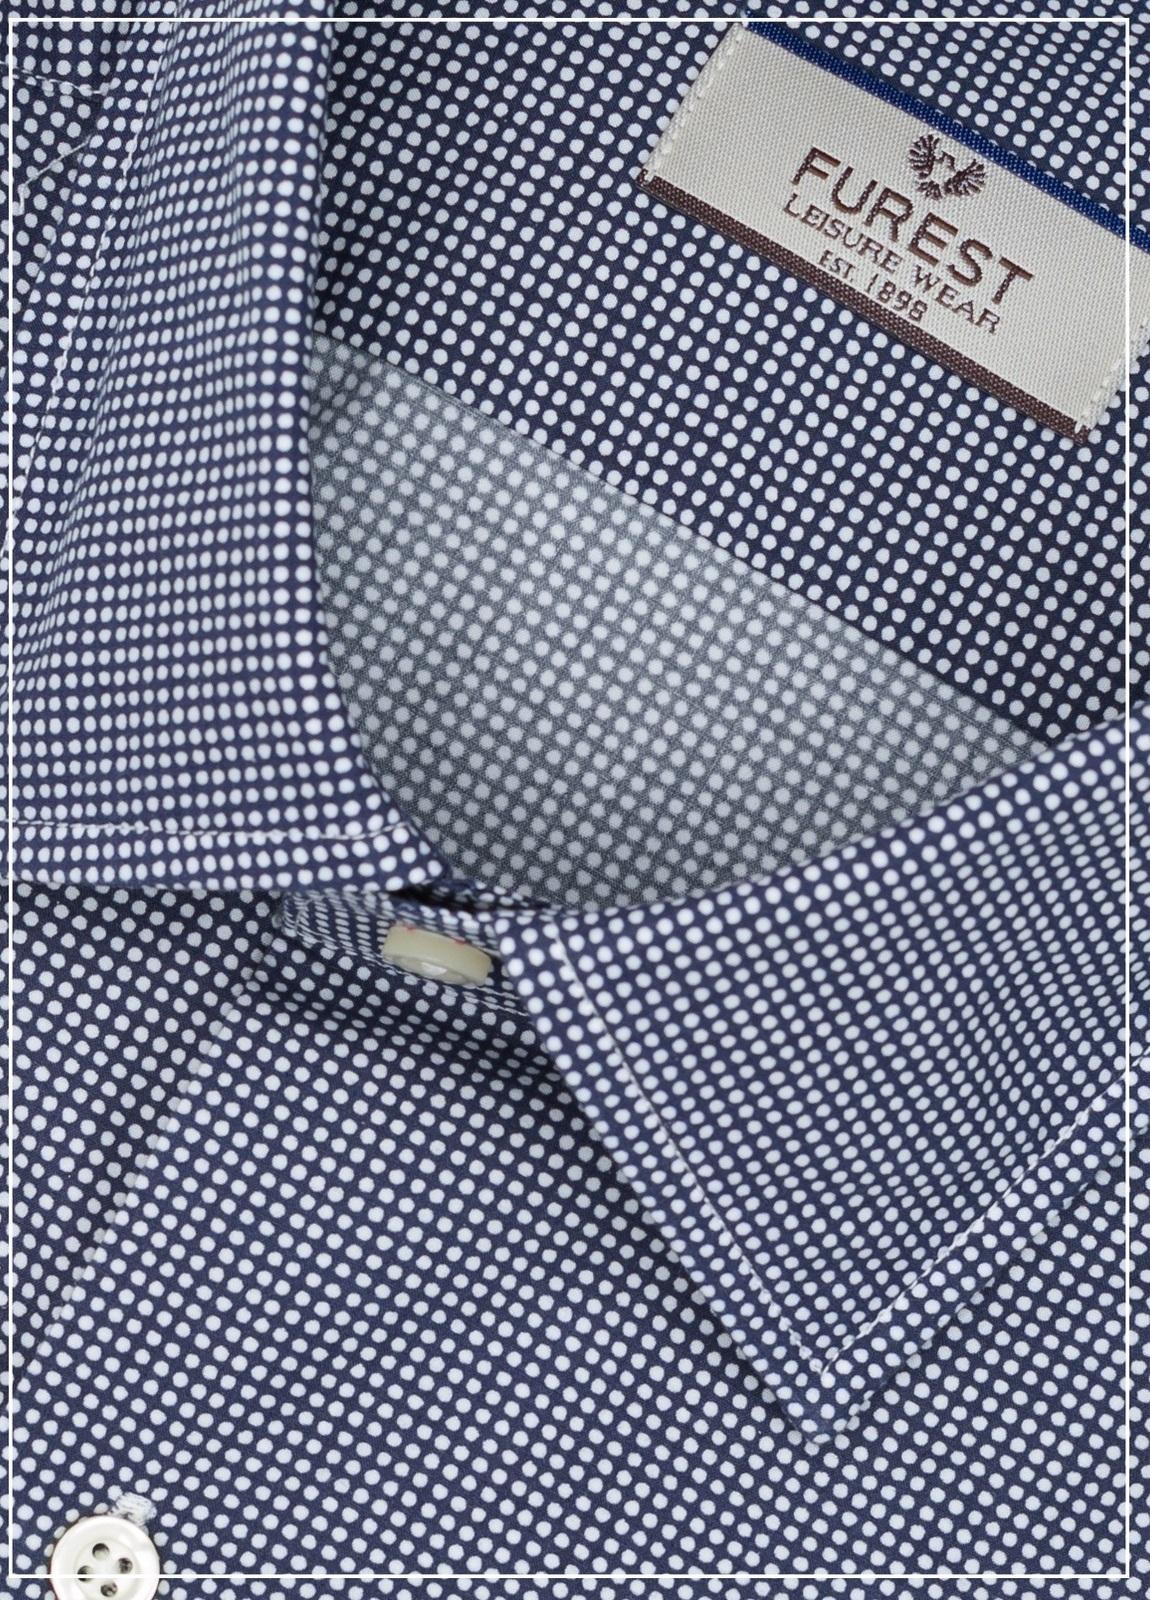 Camisa Leisure Wear SLIM FIT modelo PORTO microdibujo topos color azul marino,100% Algodón. - Ítem1